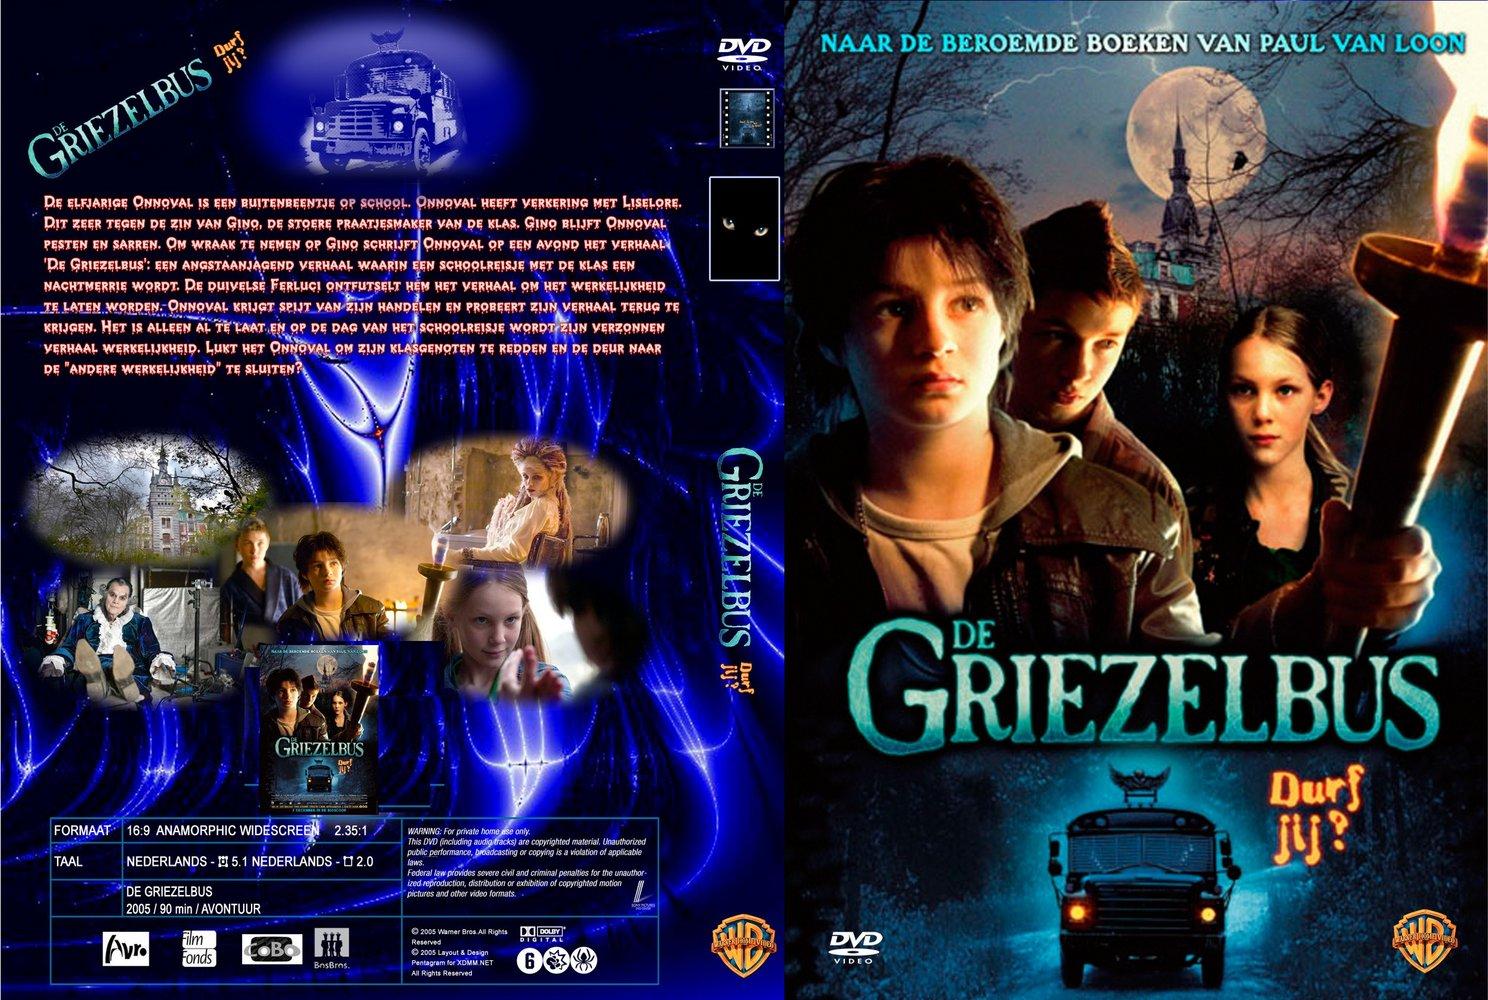 Film i dag 2005 08 17